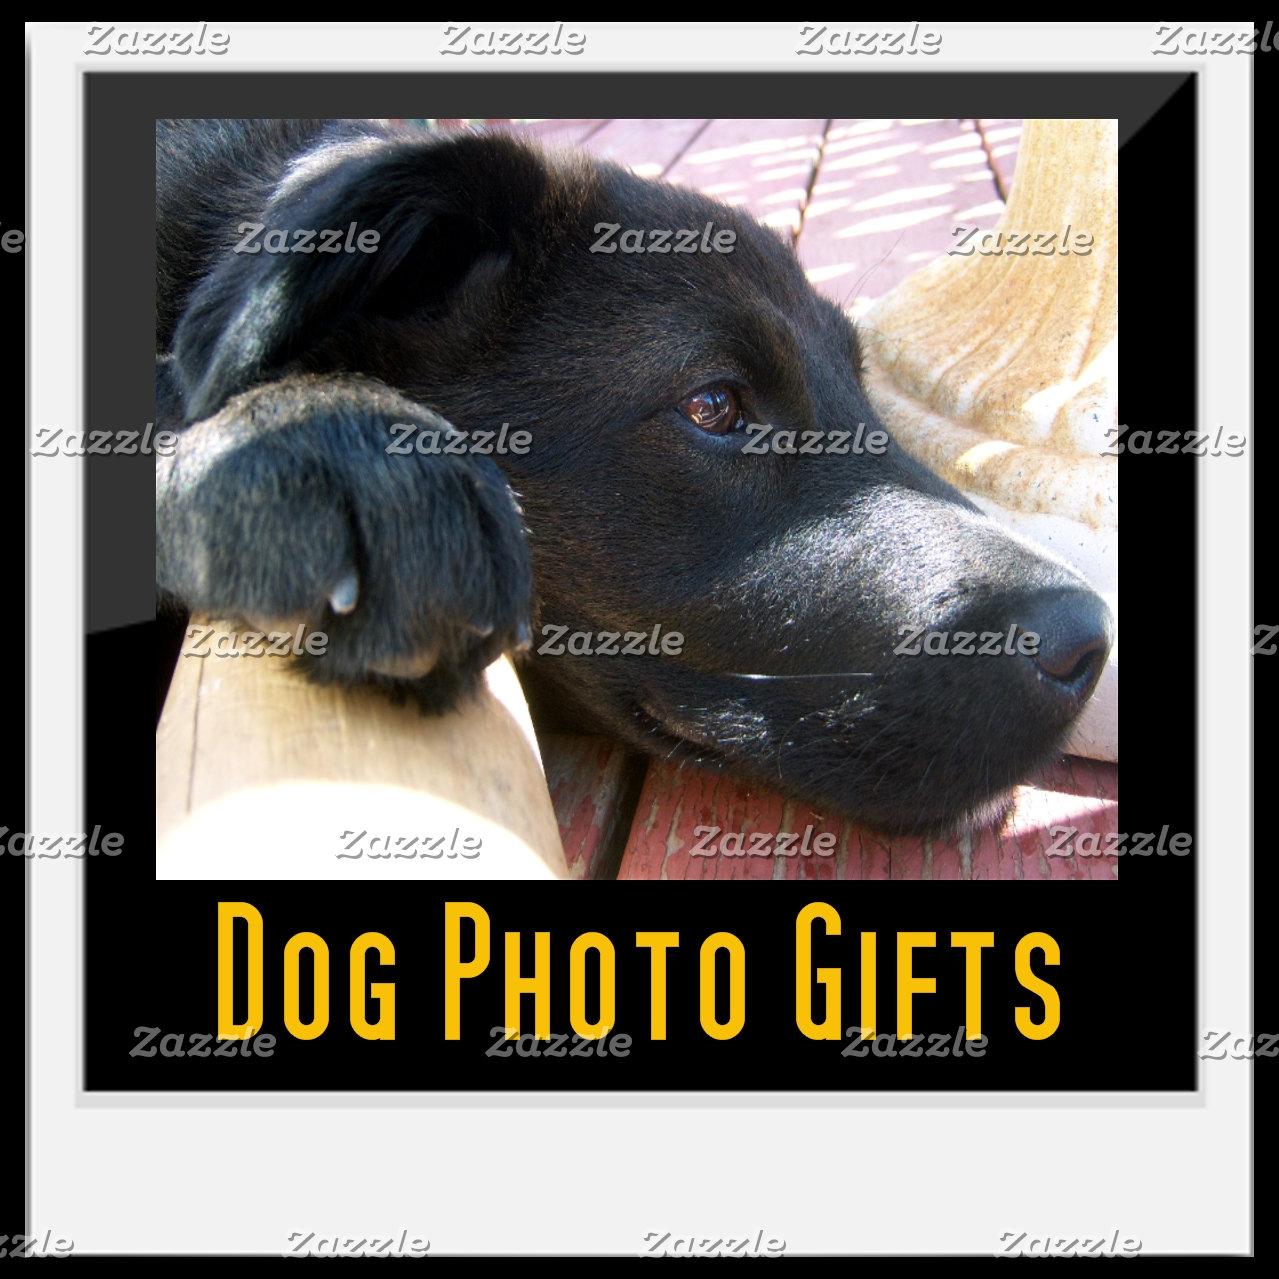 Dog Photo Gifts